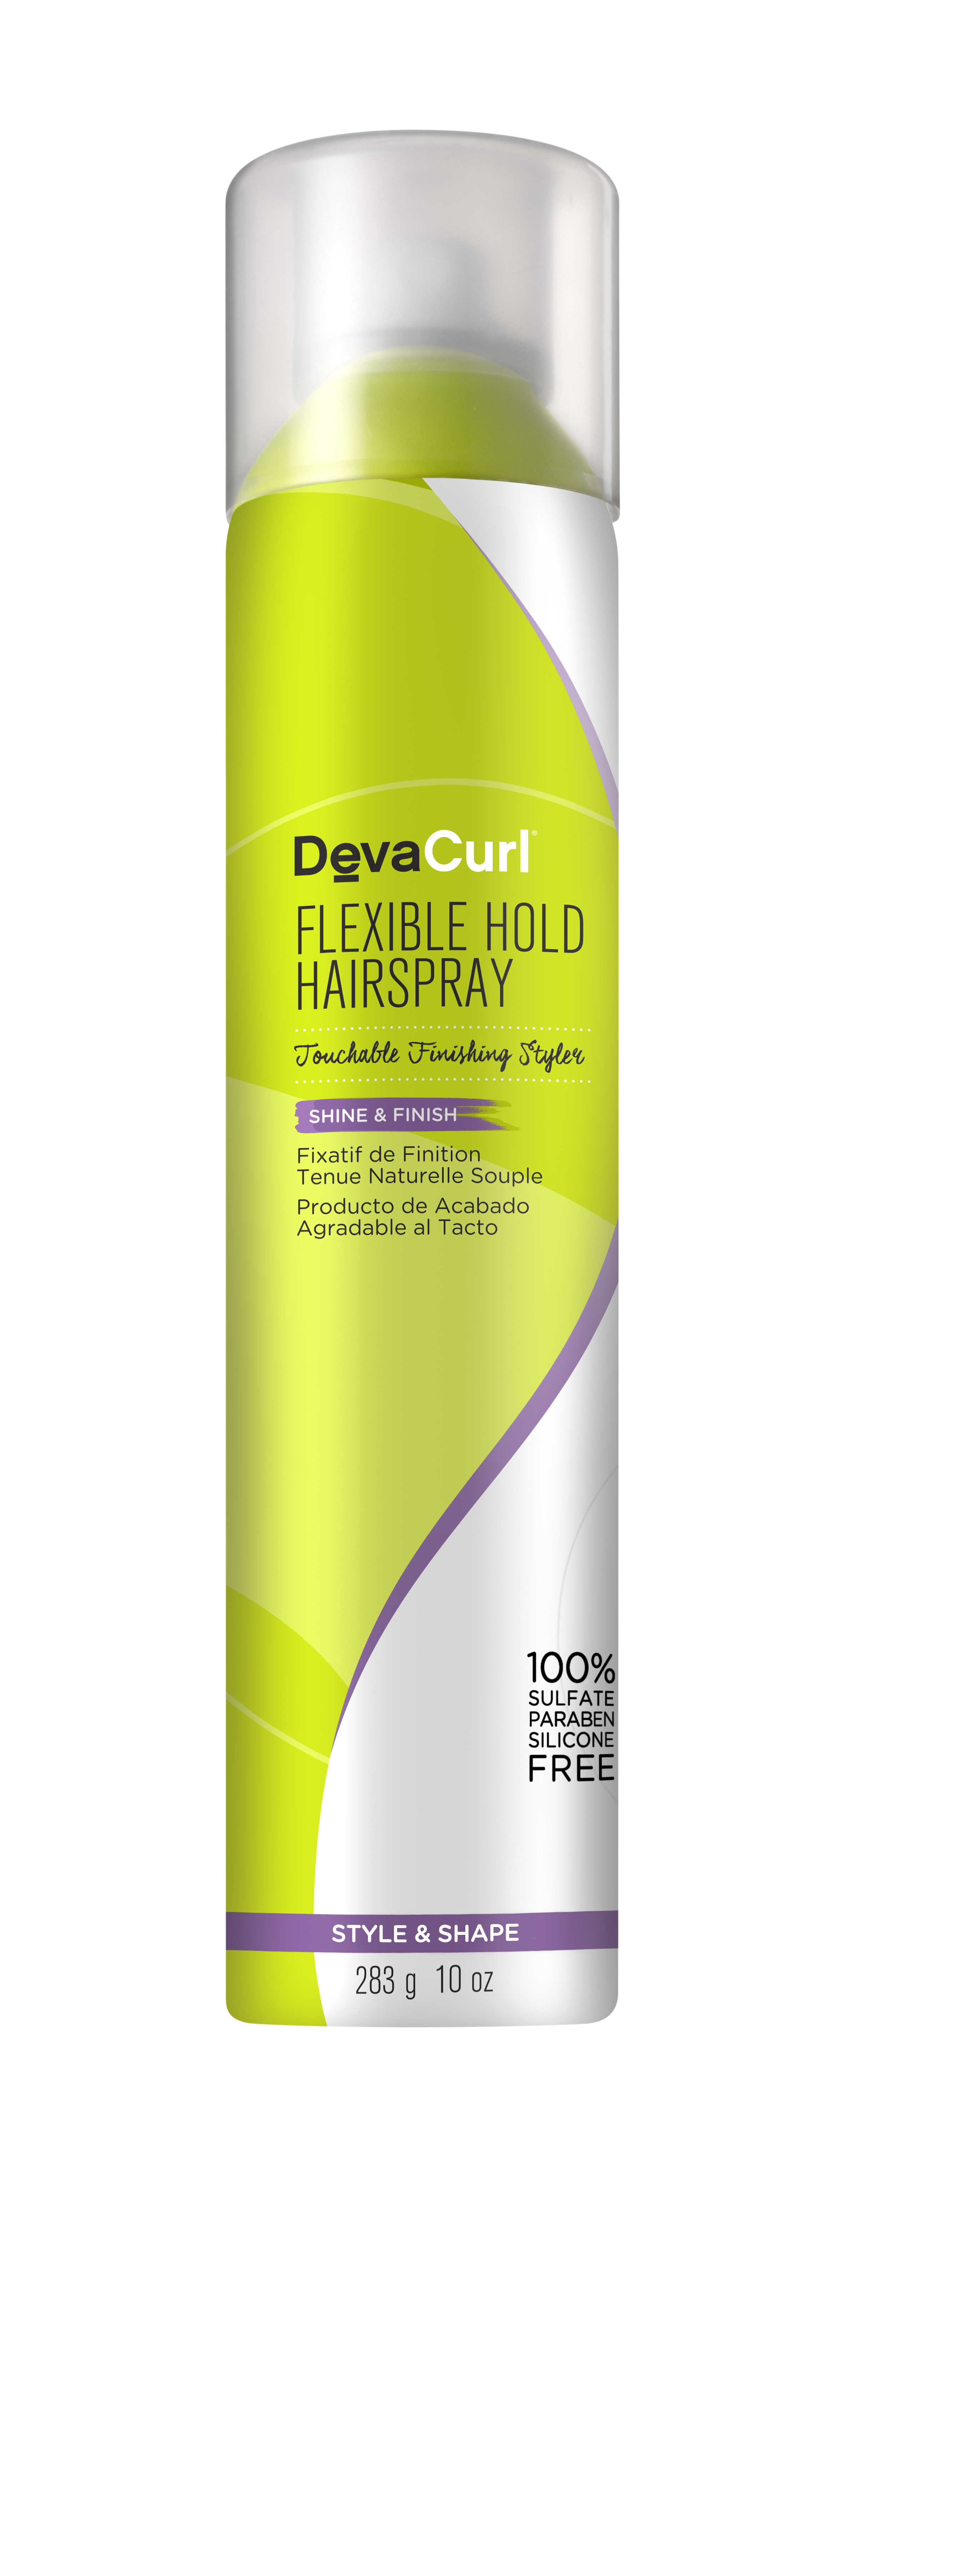 DevaCurl Flexible Hold Hair Spray